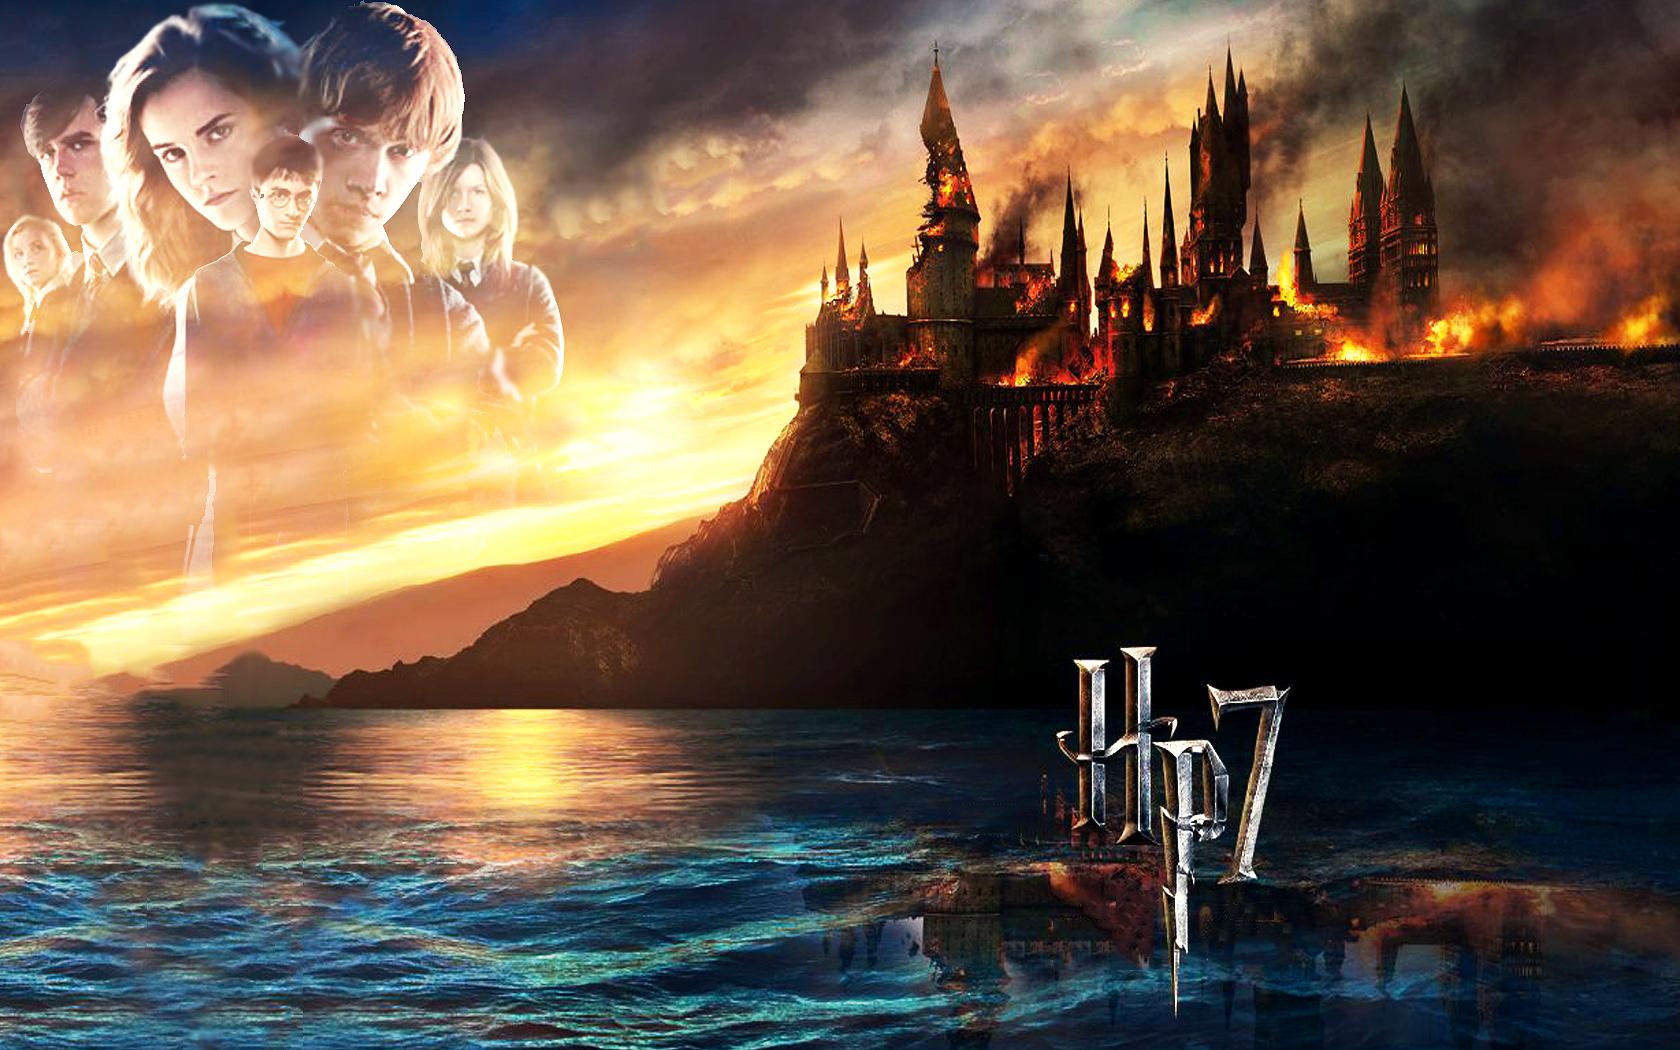 Harry Potter 7 - wallpaper